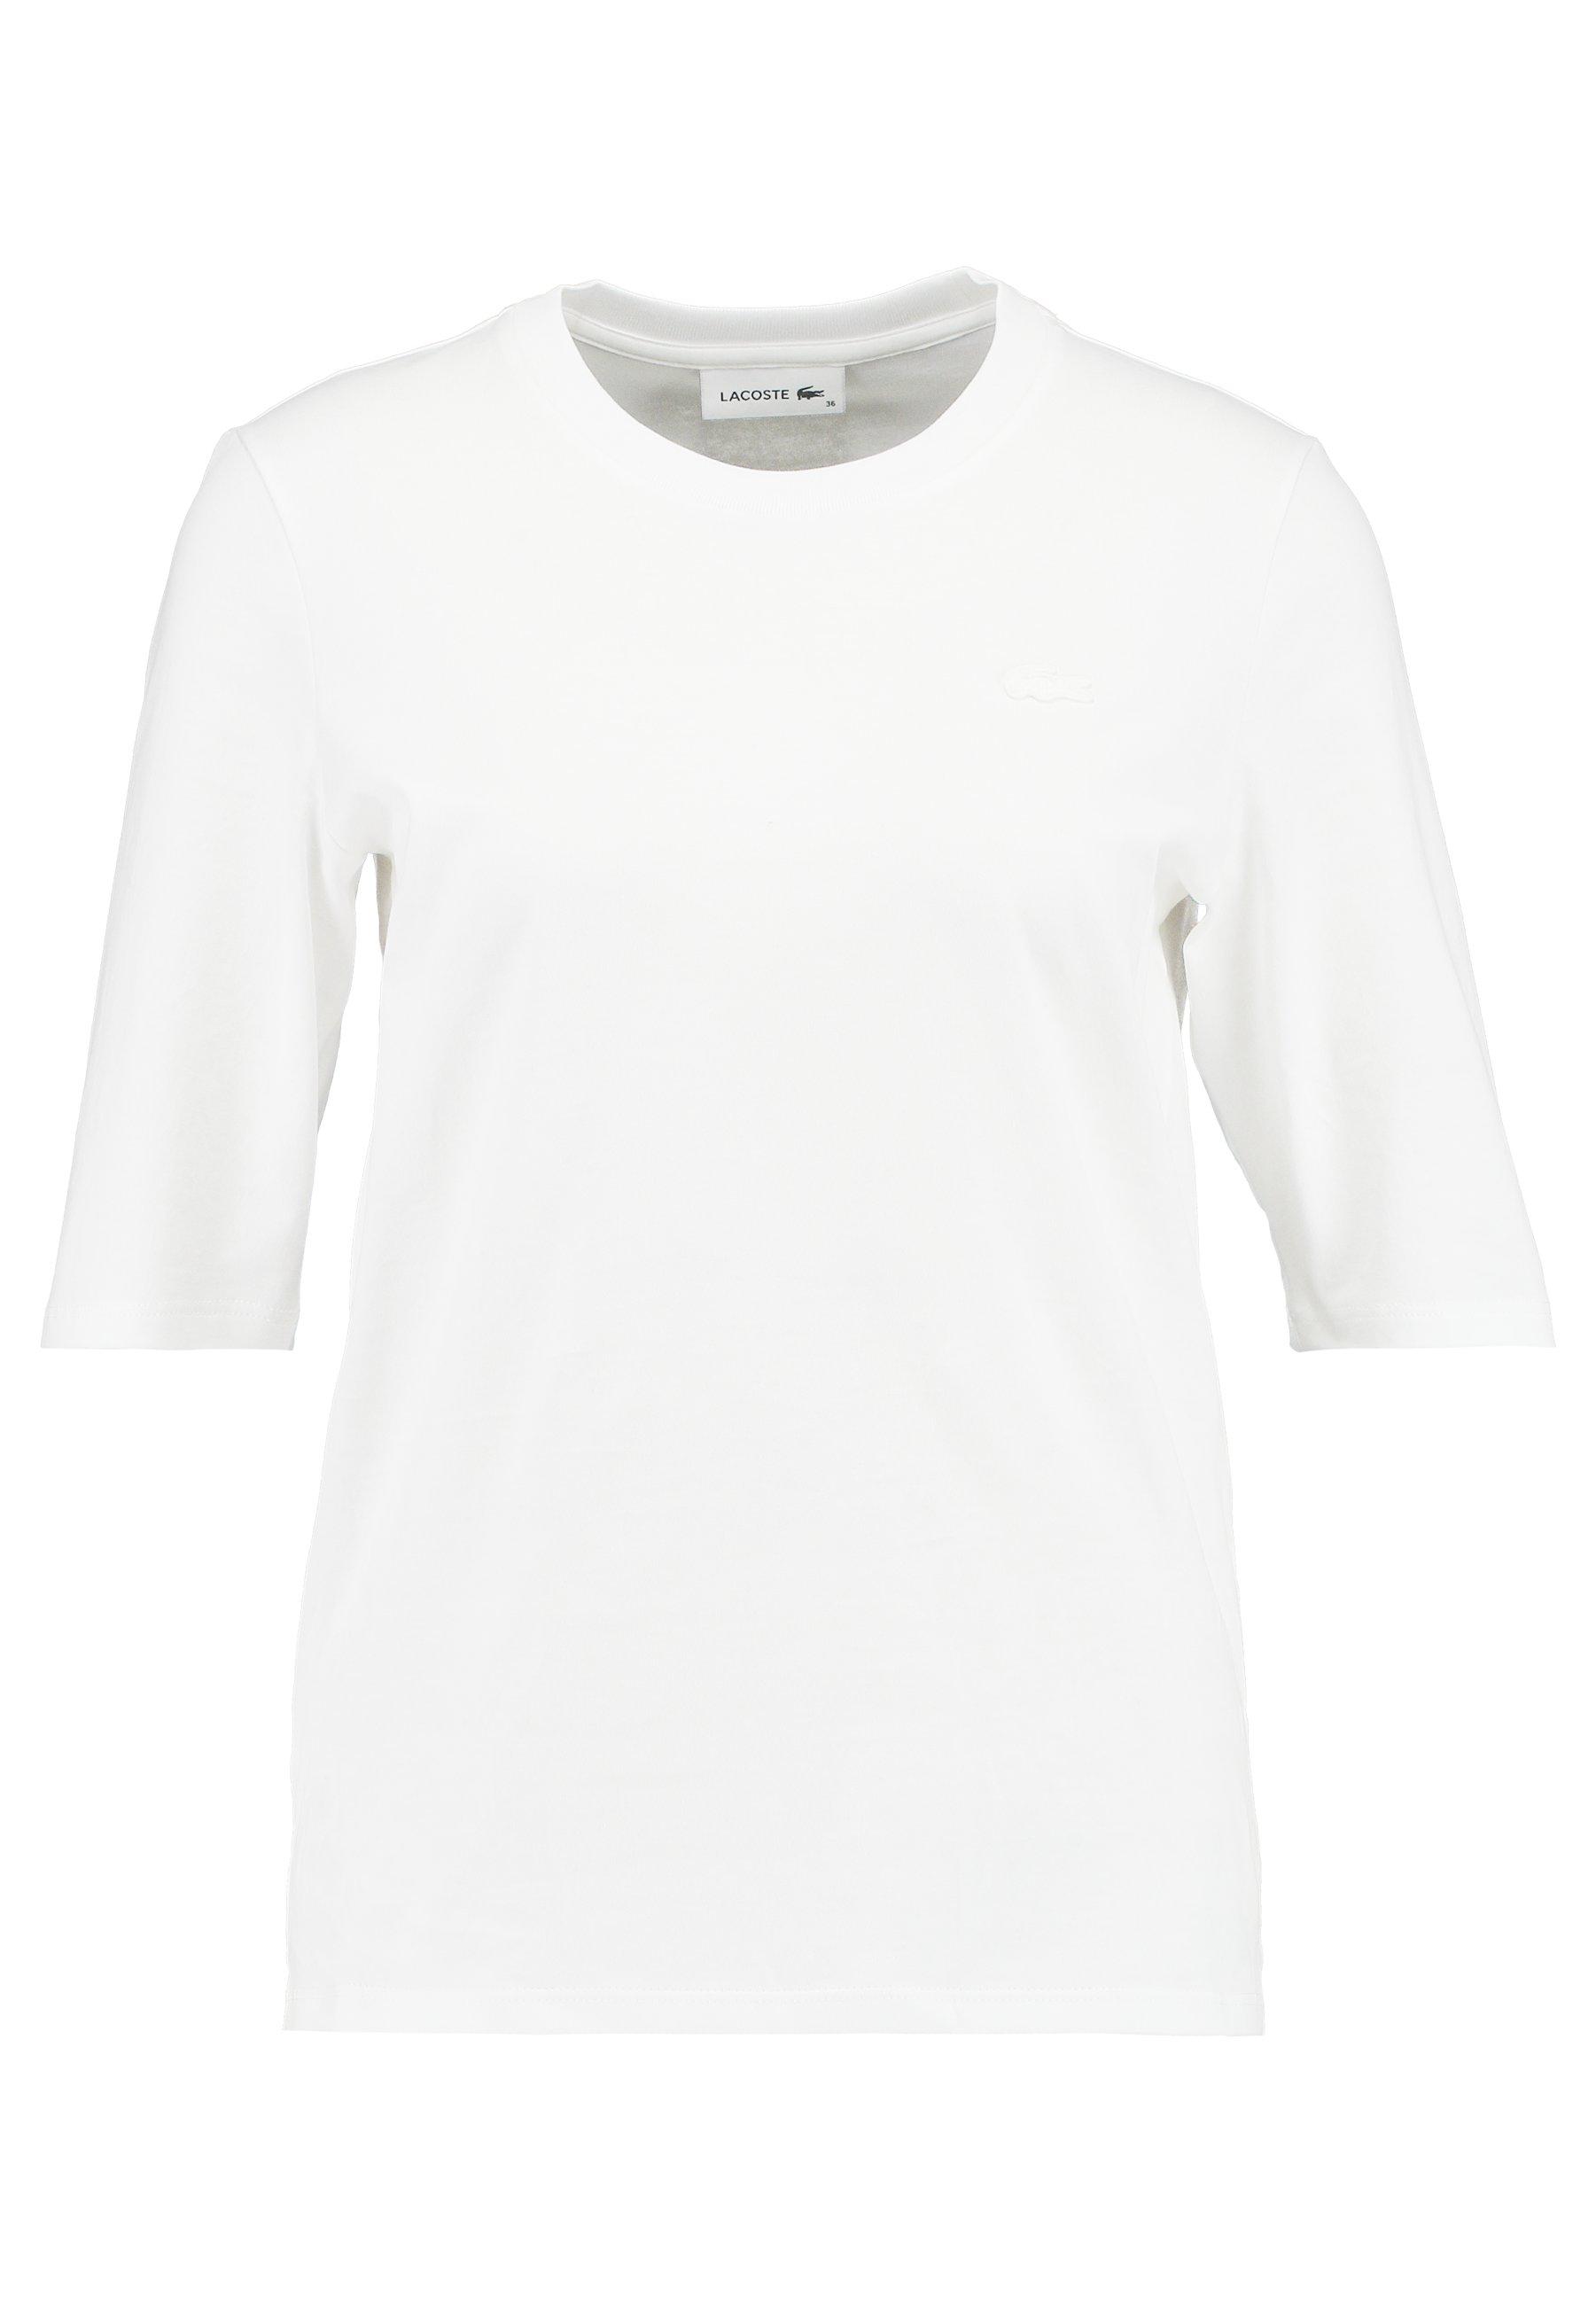 Lacoste Round Neck Classic Tee - T-shirt Basic Navy Blue